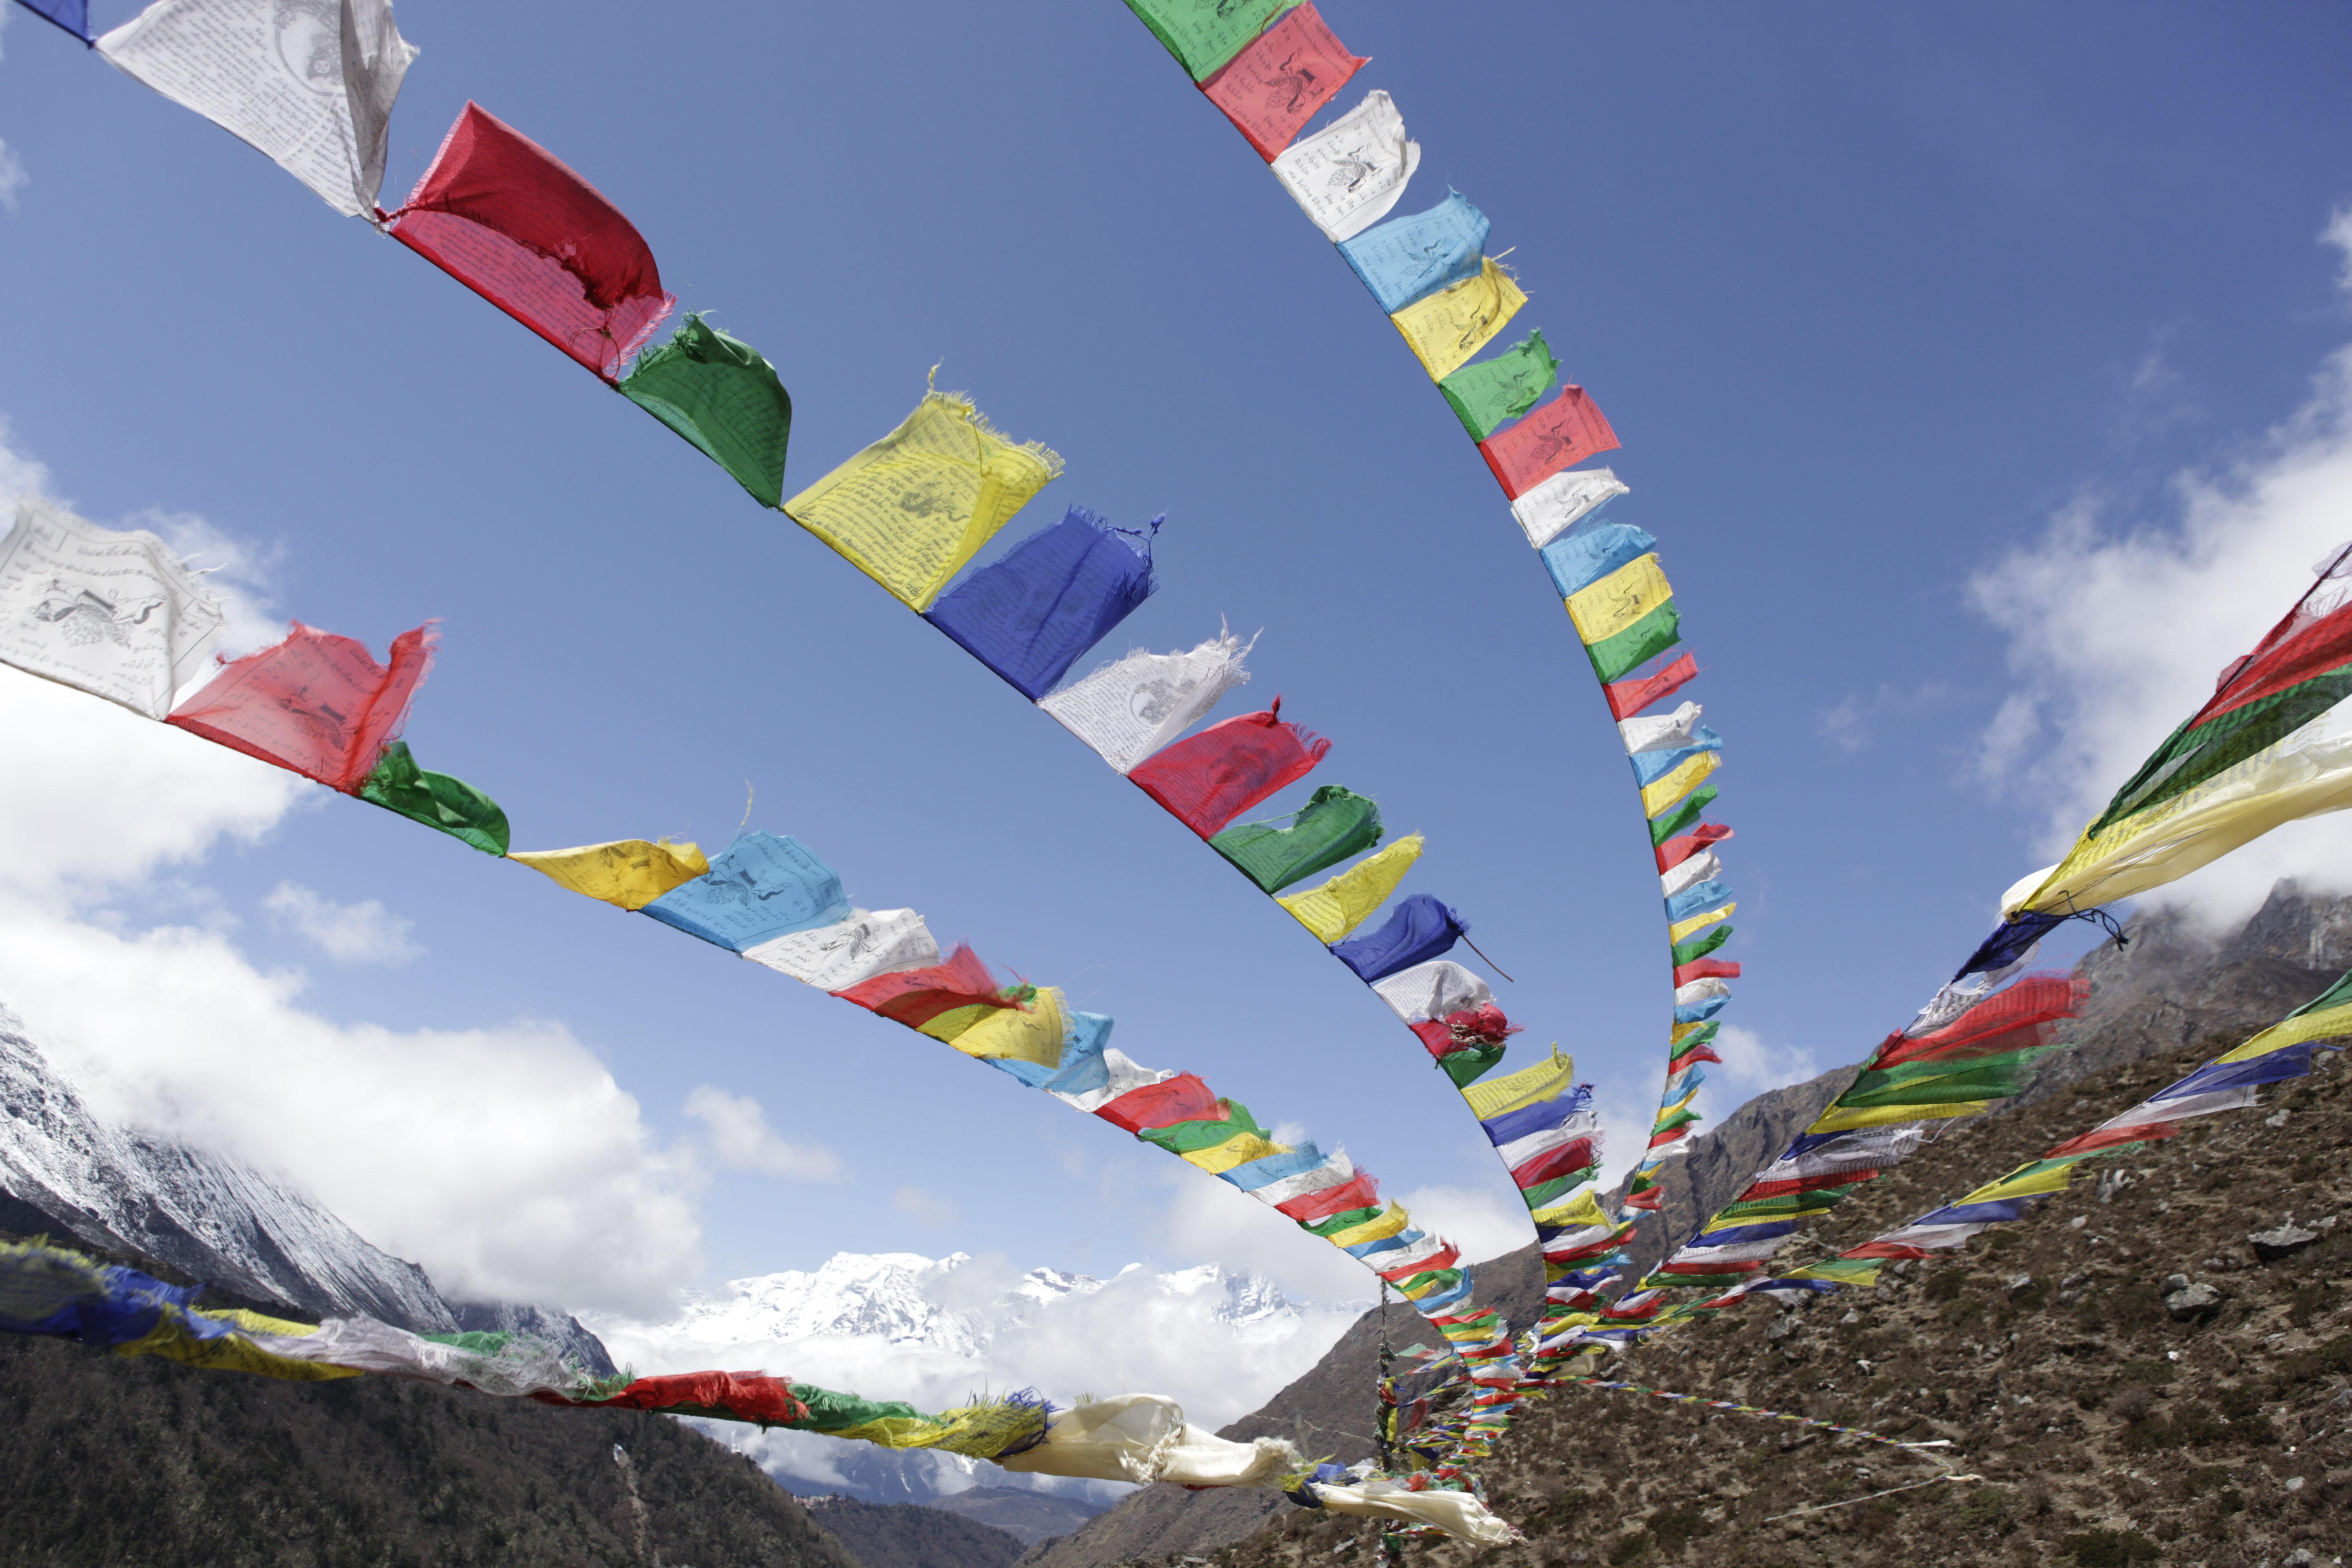 Sherpa Prayer flags